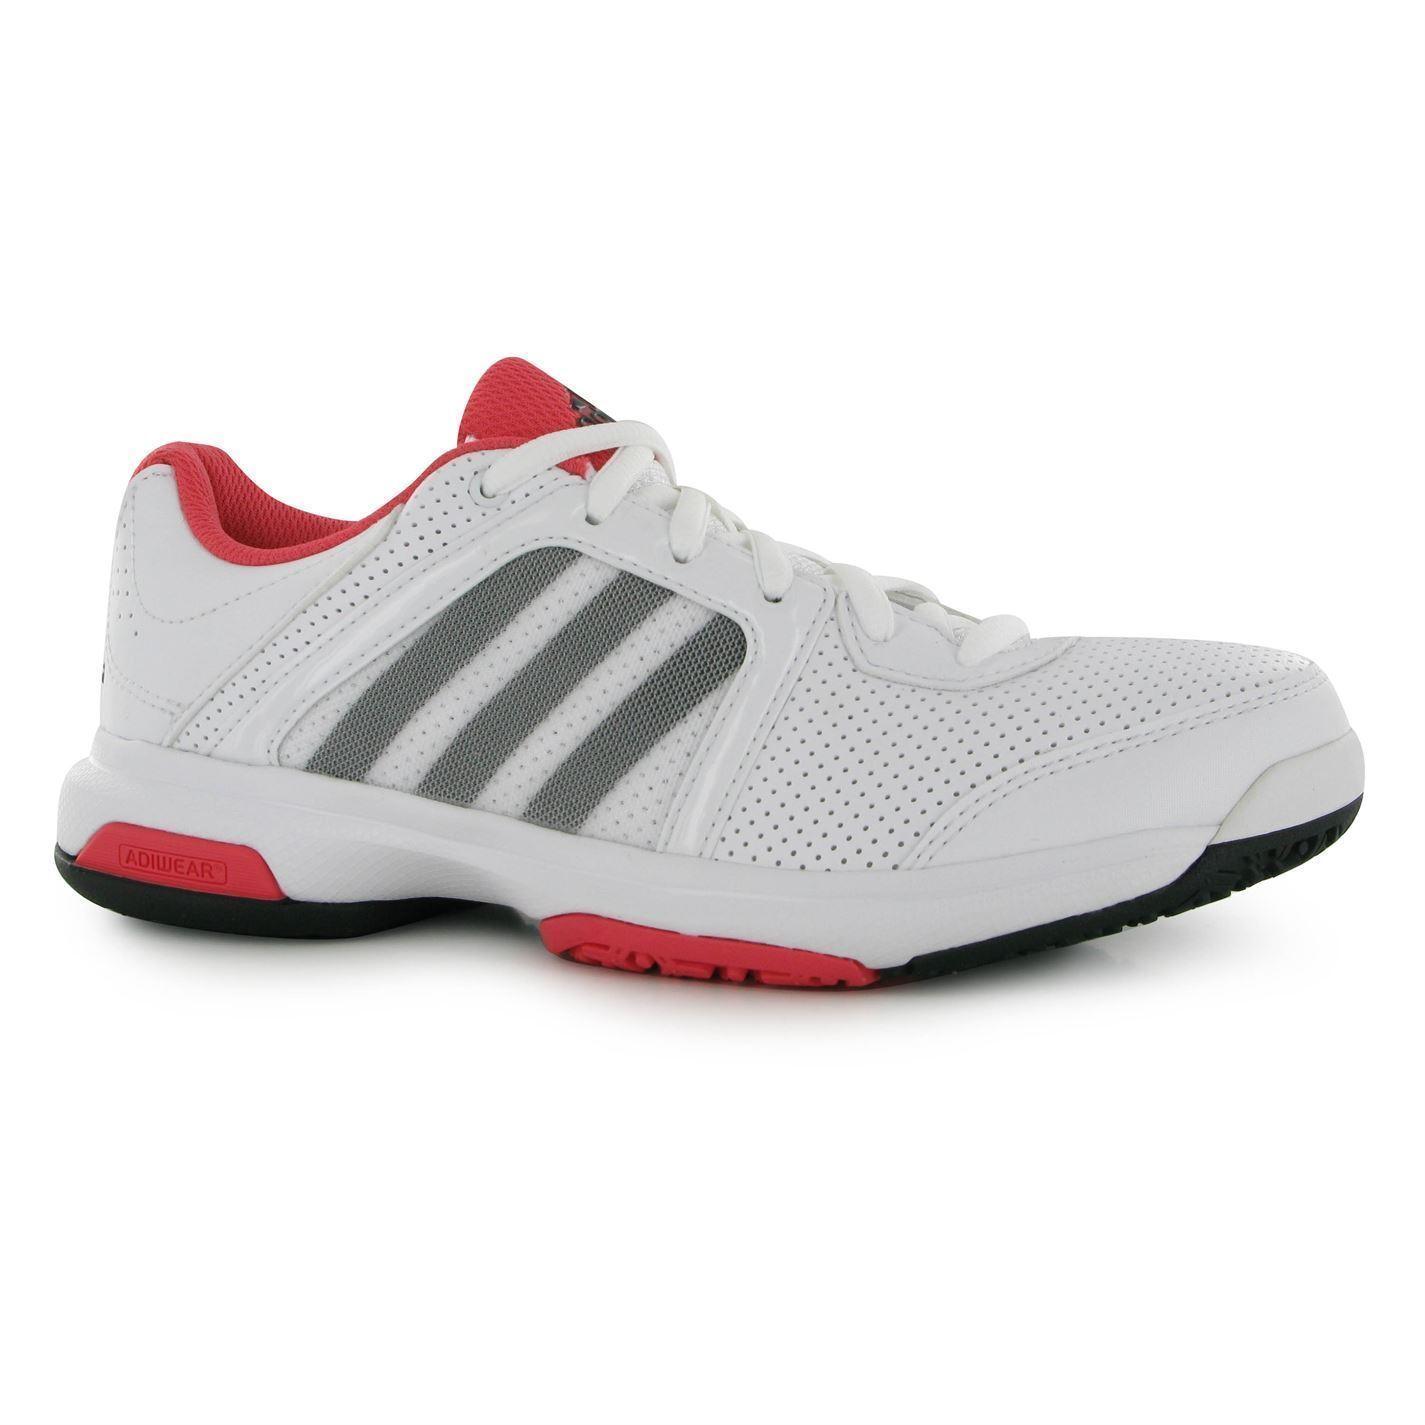 Adidas Barricade Aspire trainers size UK 3 1 2 BNIB